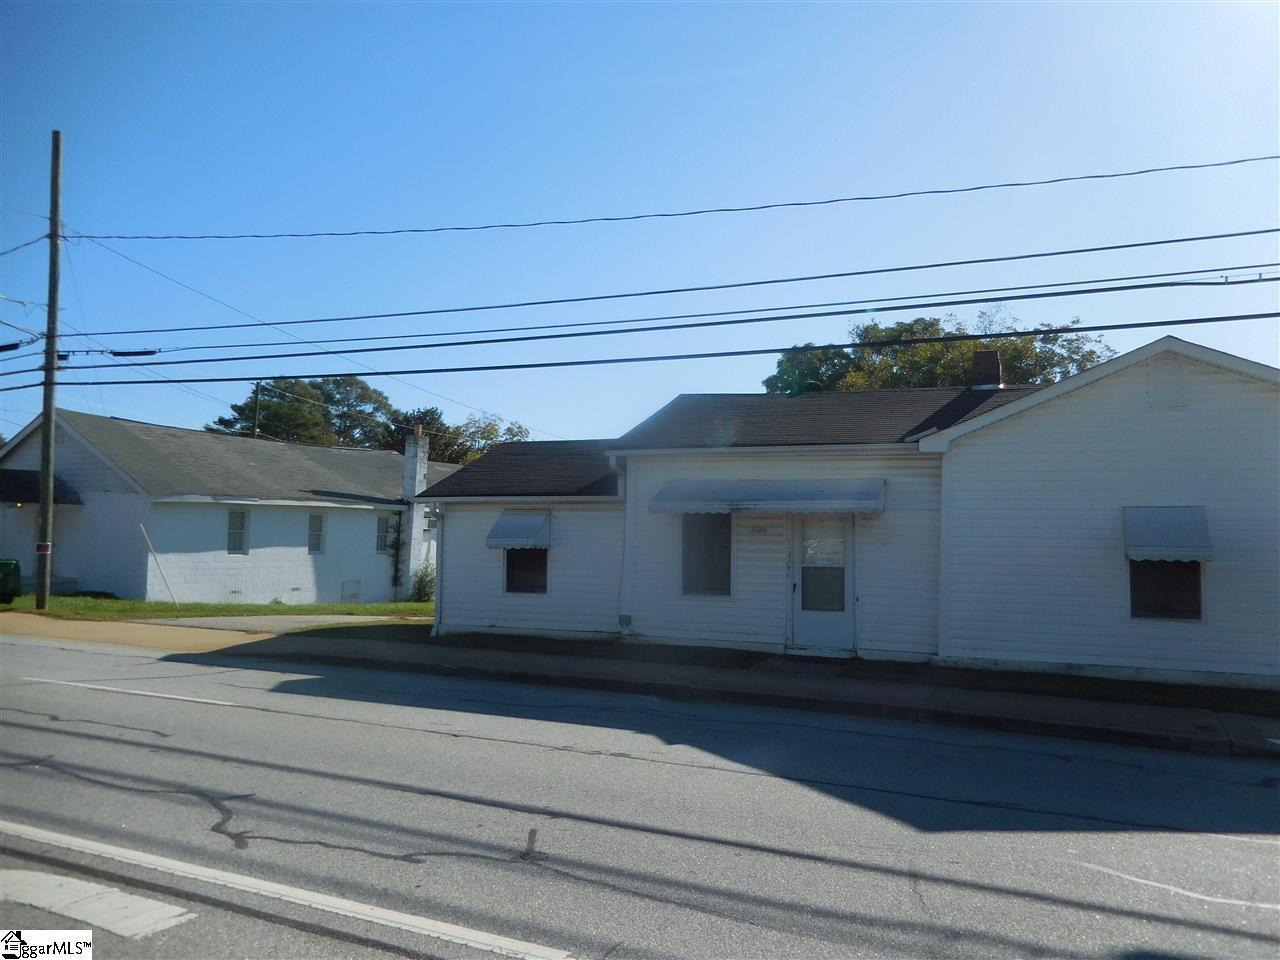 5084 S Main Street Cowpens, SC 29330